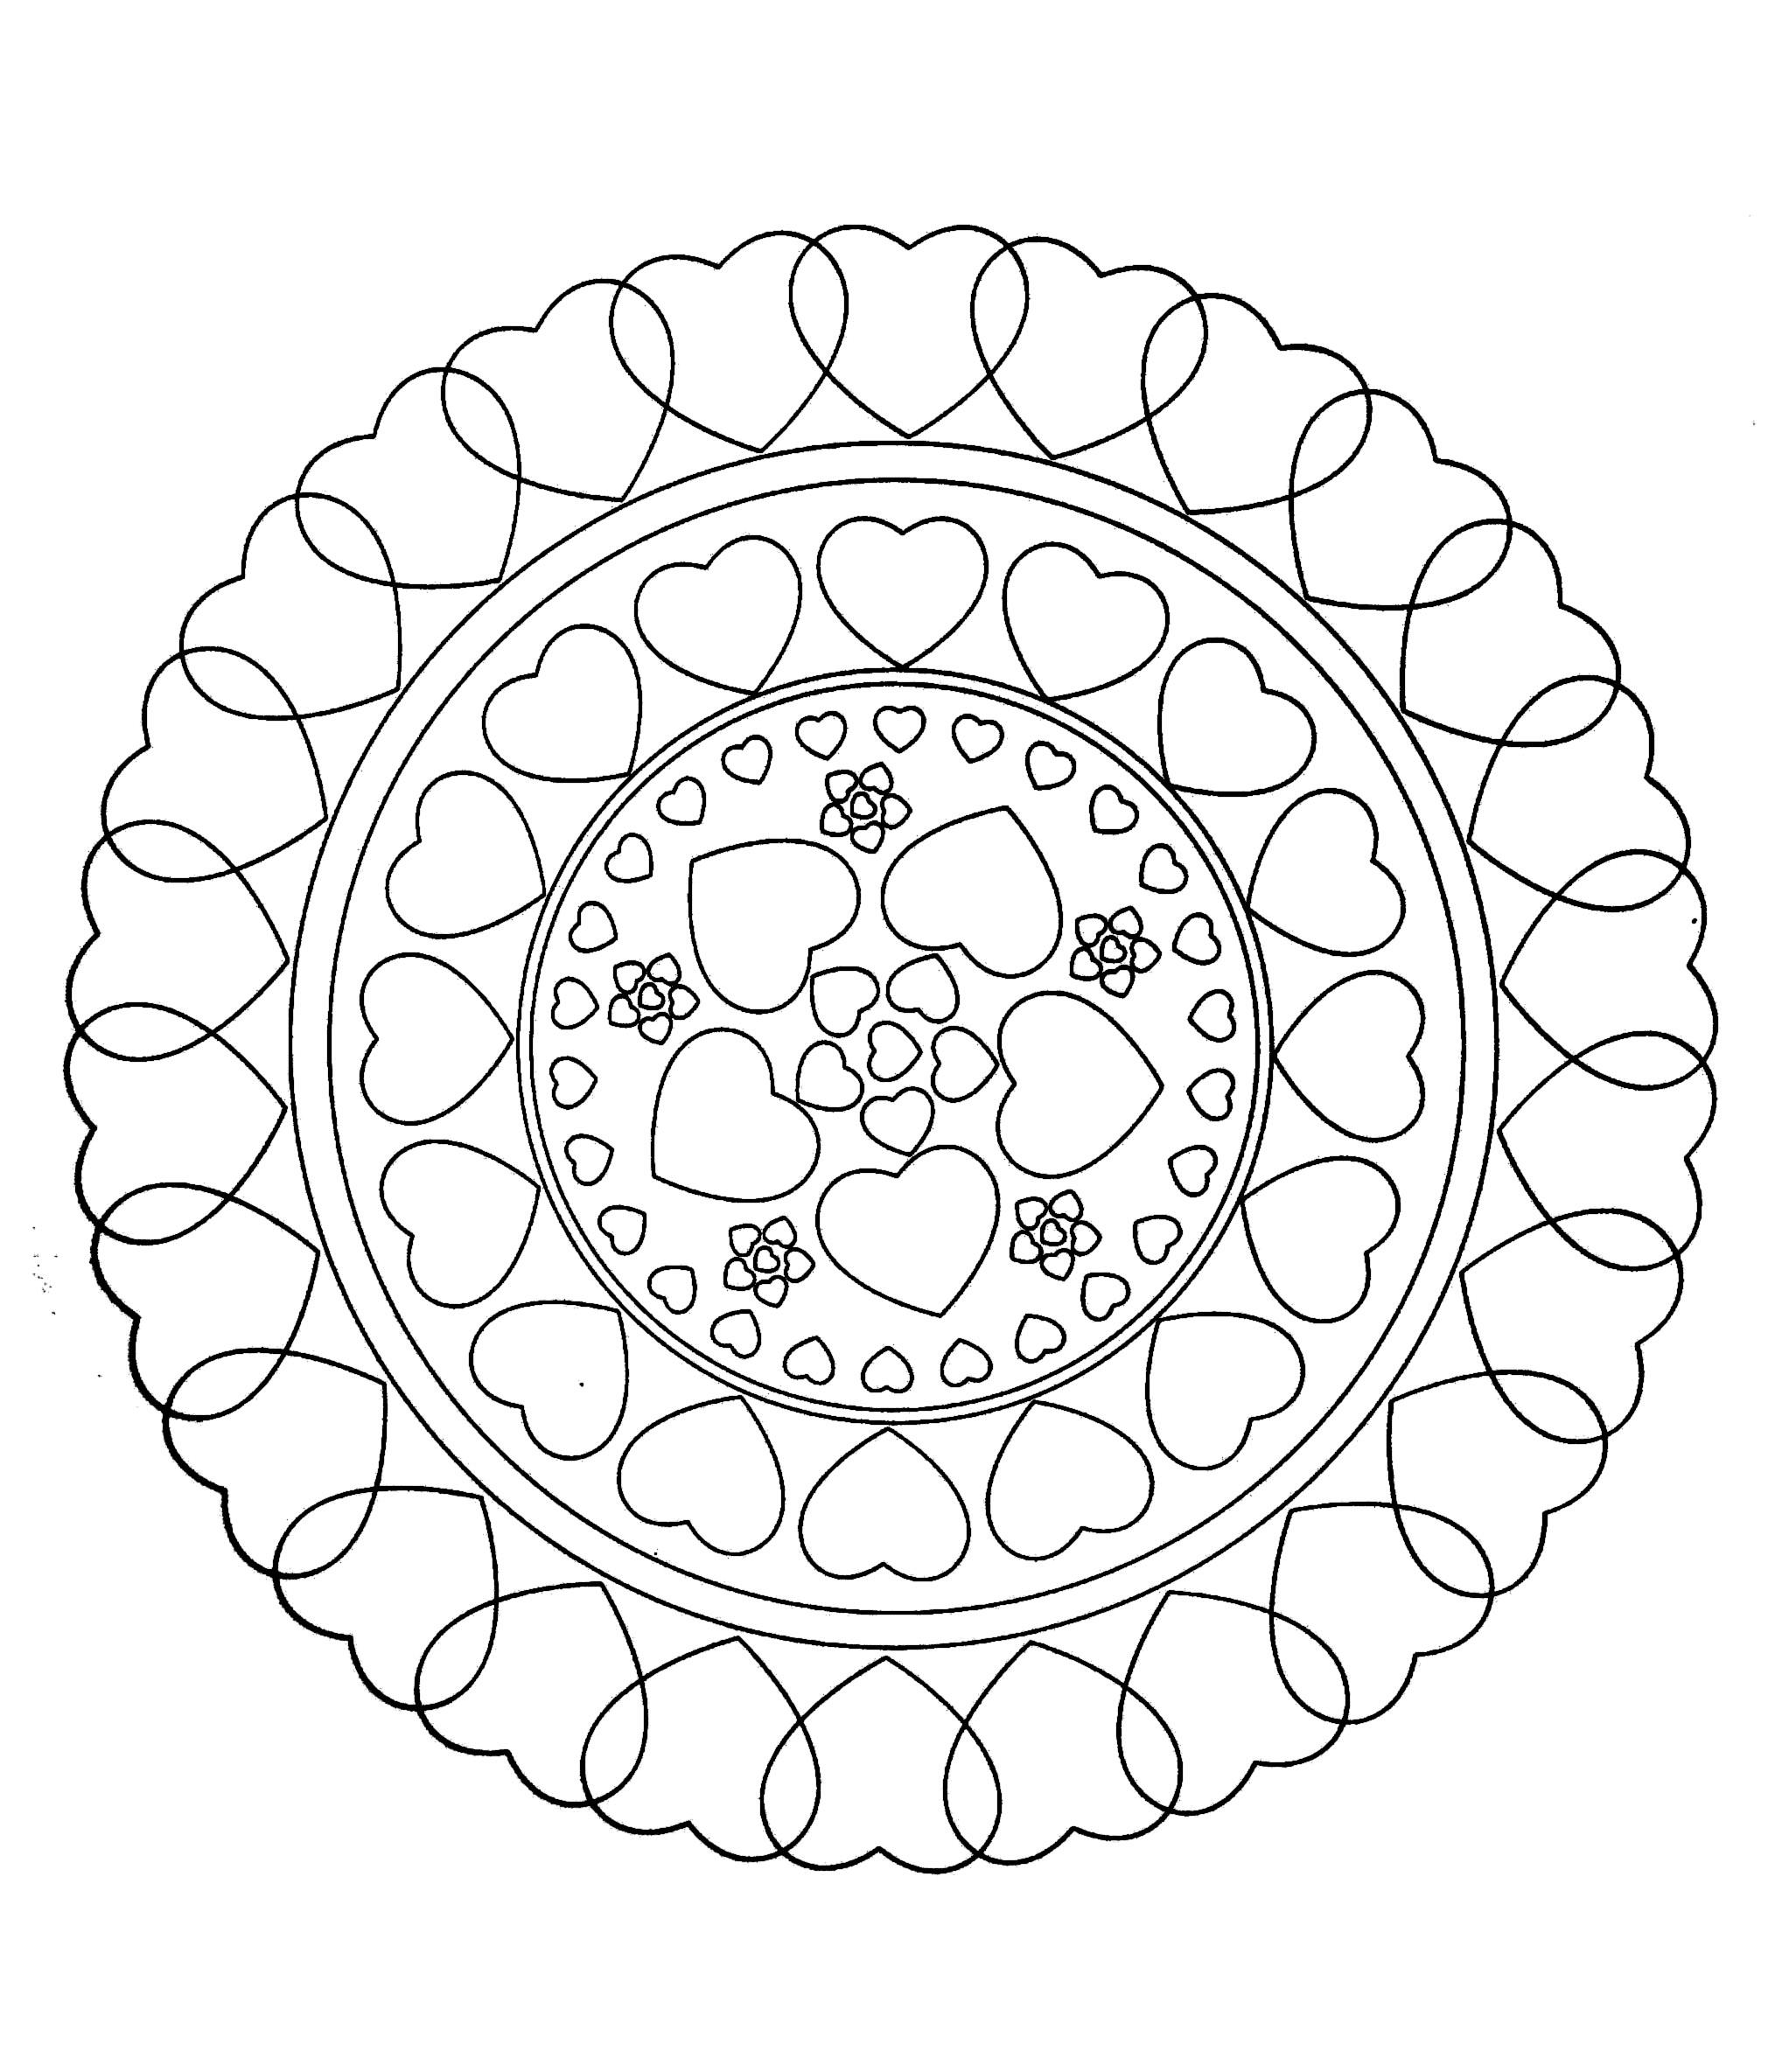 Mandala A Colorier Zen Relax Gratuit 26 Mandalas Zen